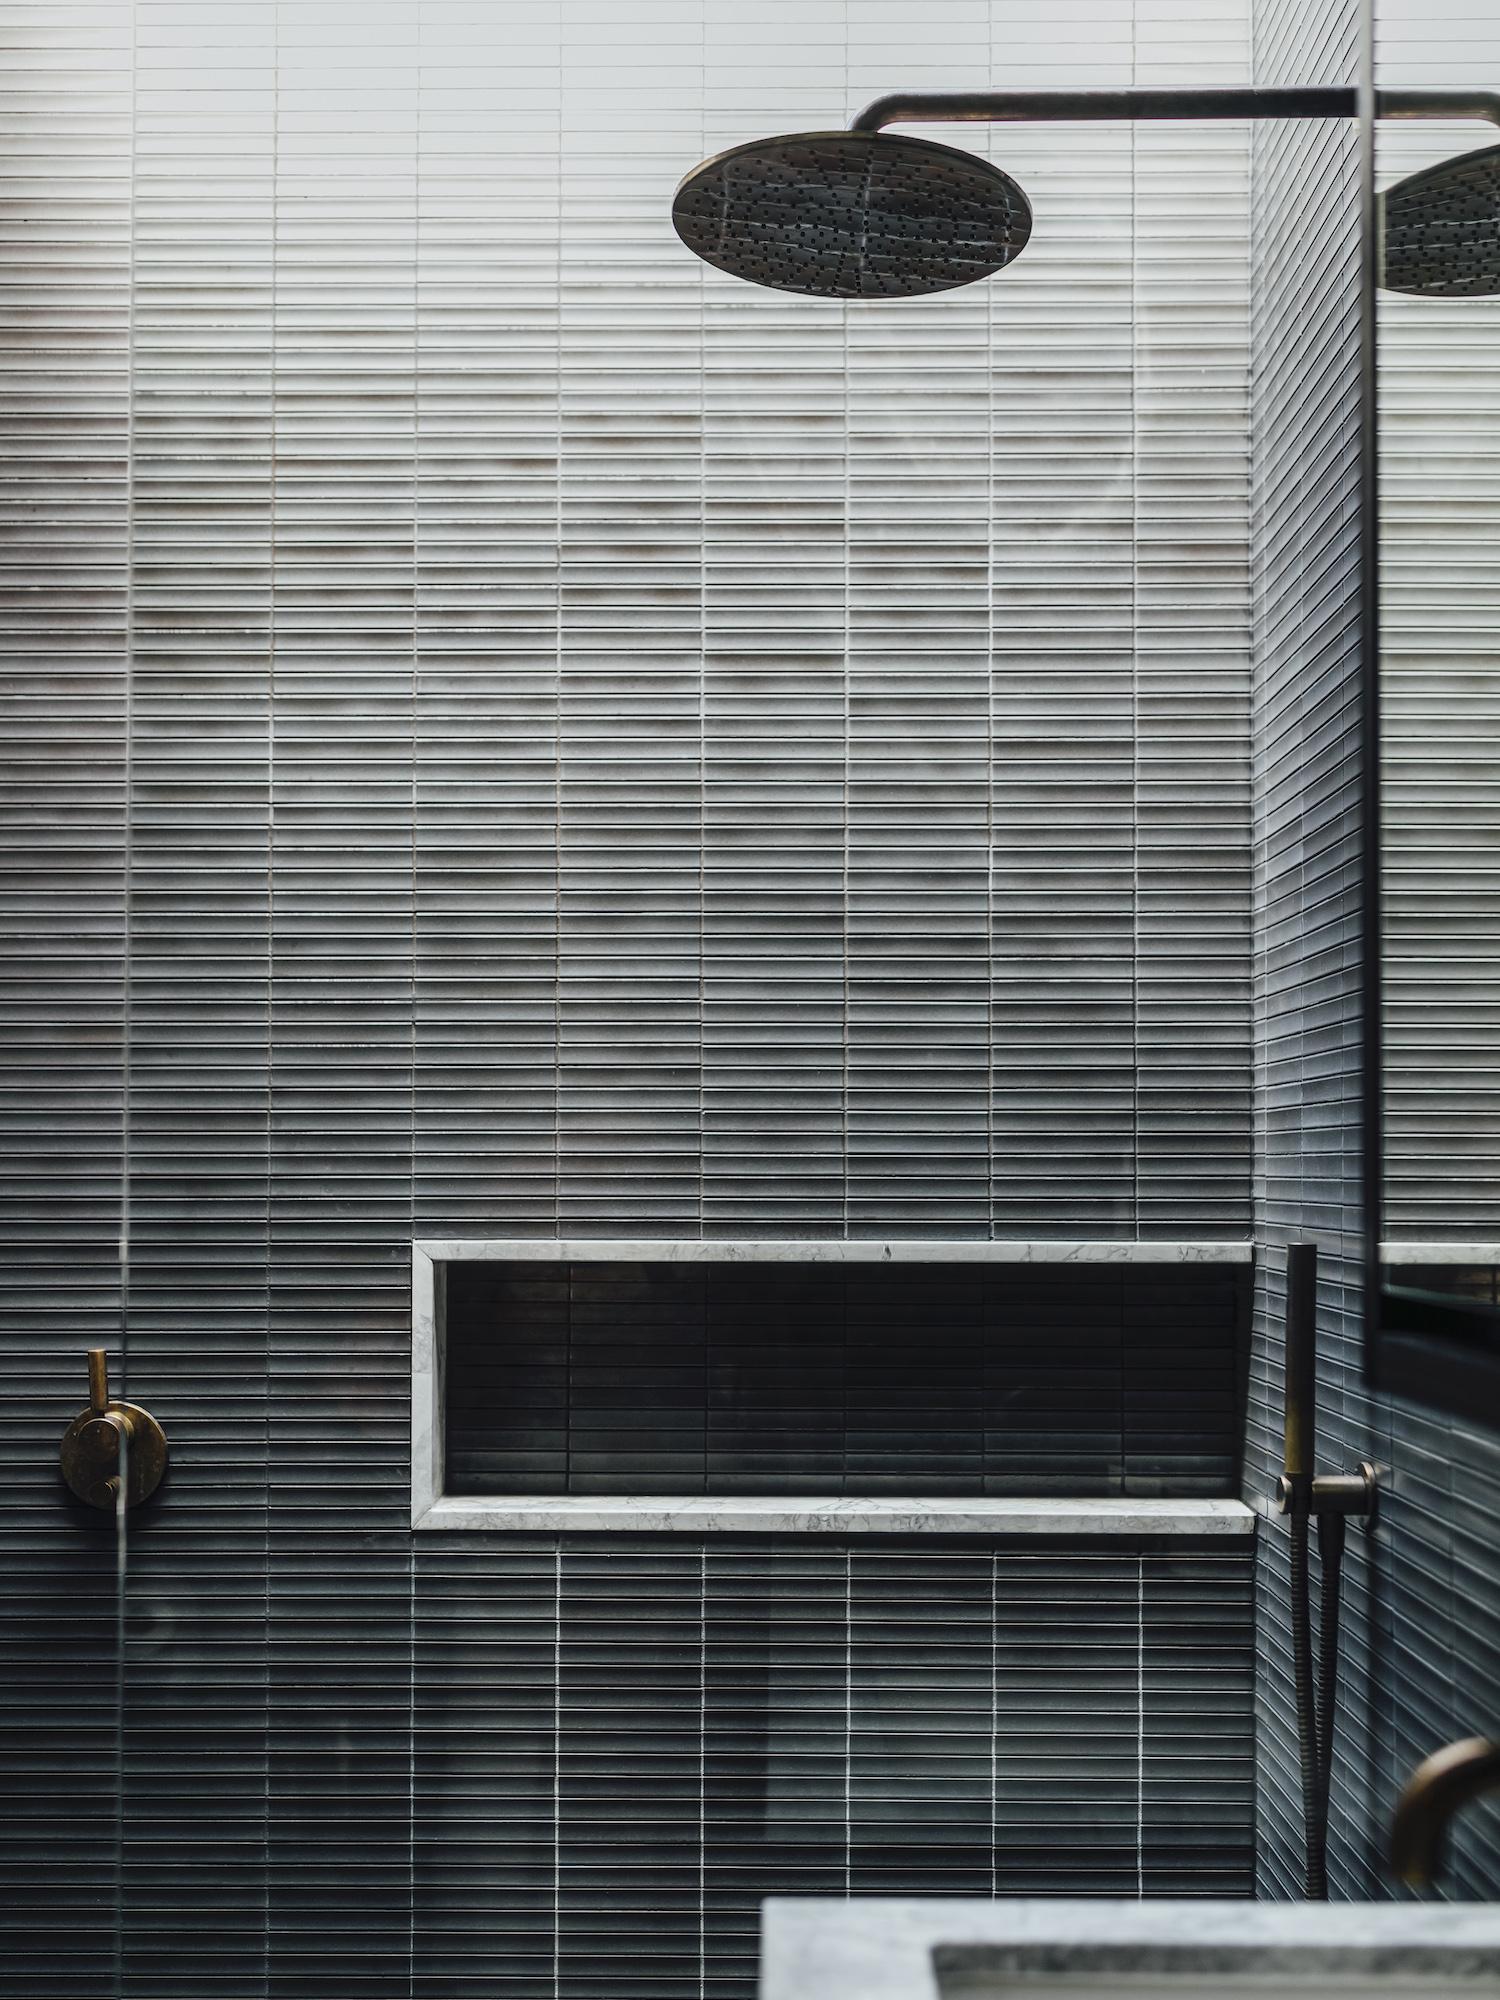 est living windsor terrace pleysier perkins 11